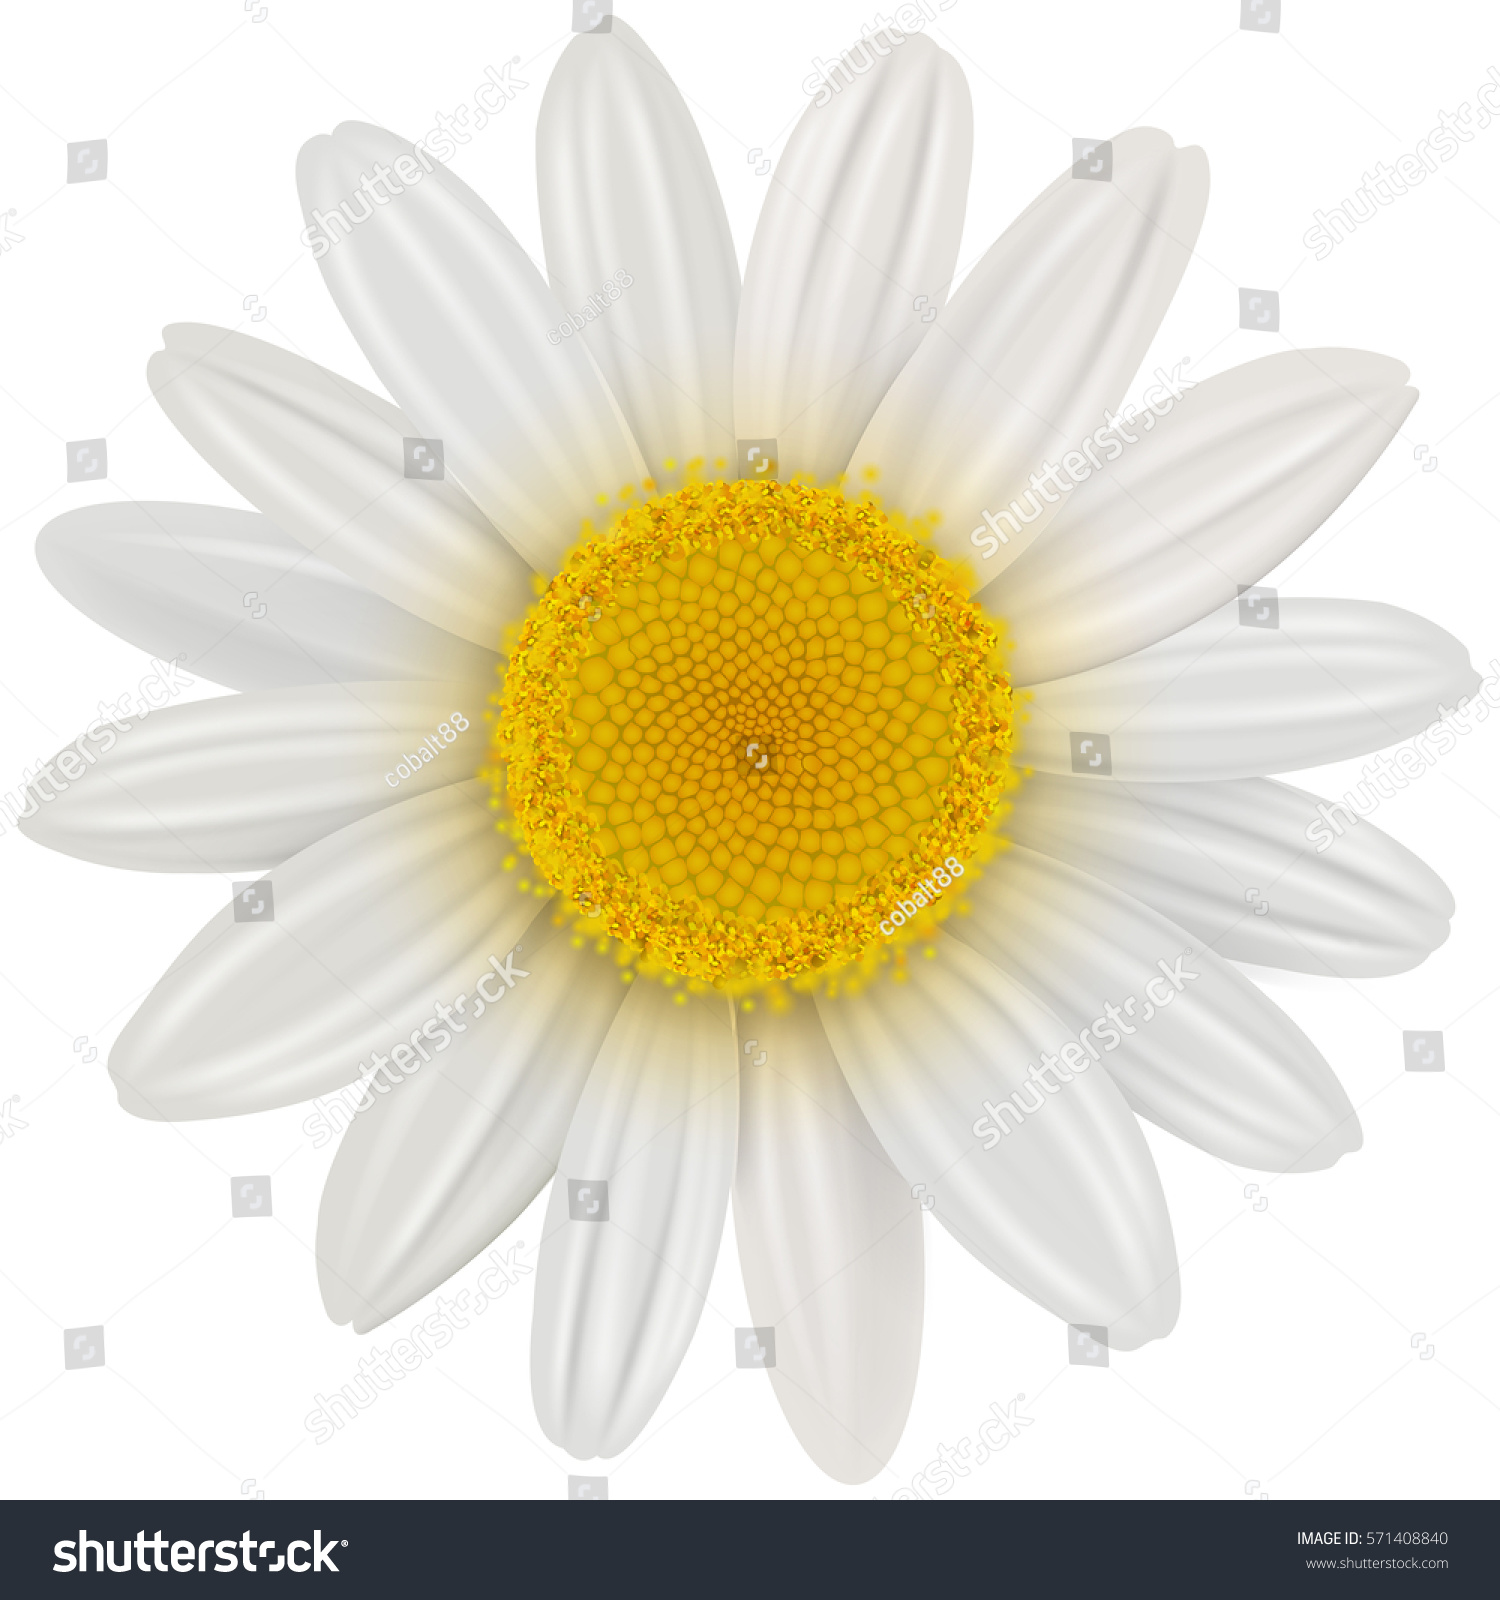 Daisy Flower Isolated Vector Illustration Stock Vector Royalty Free